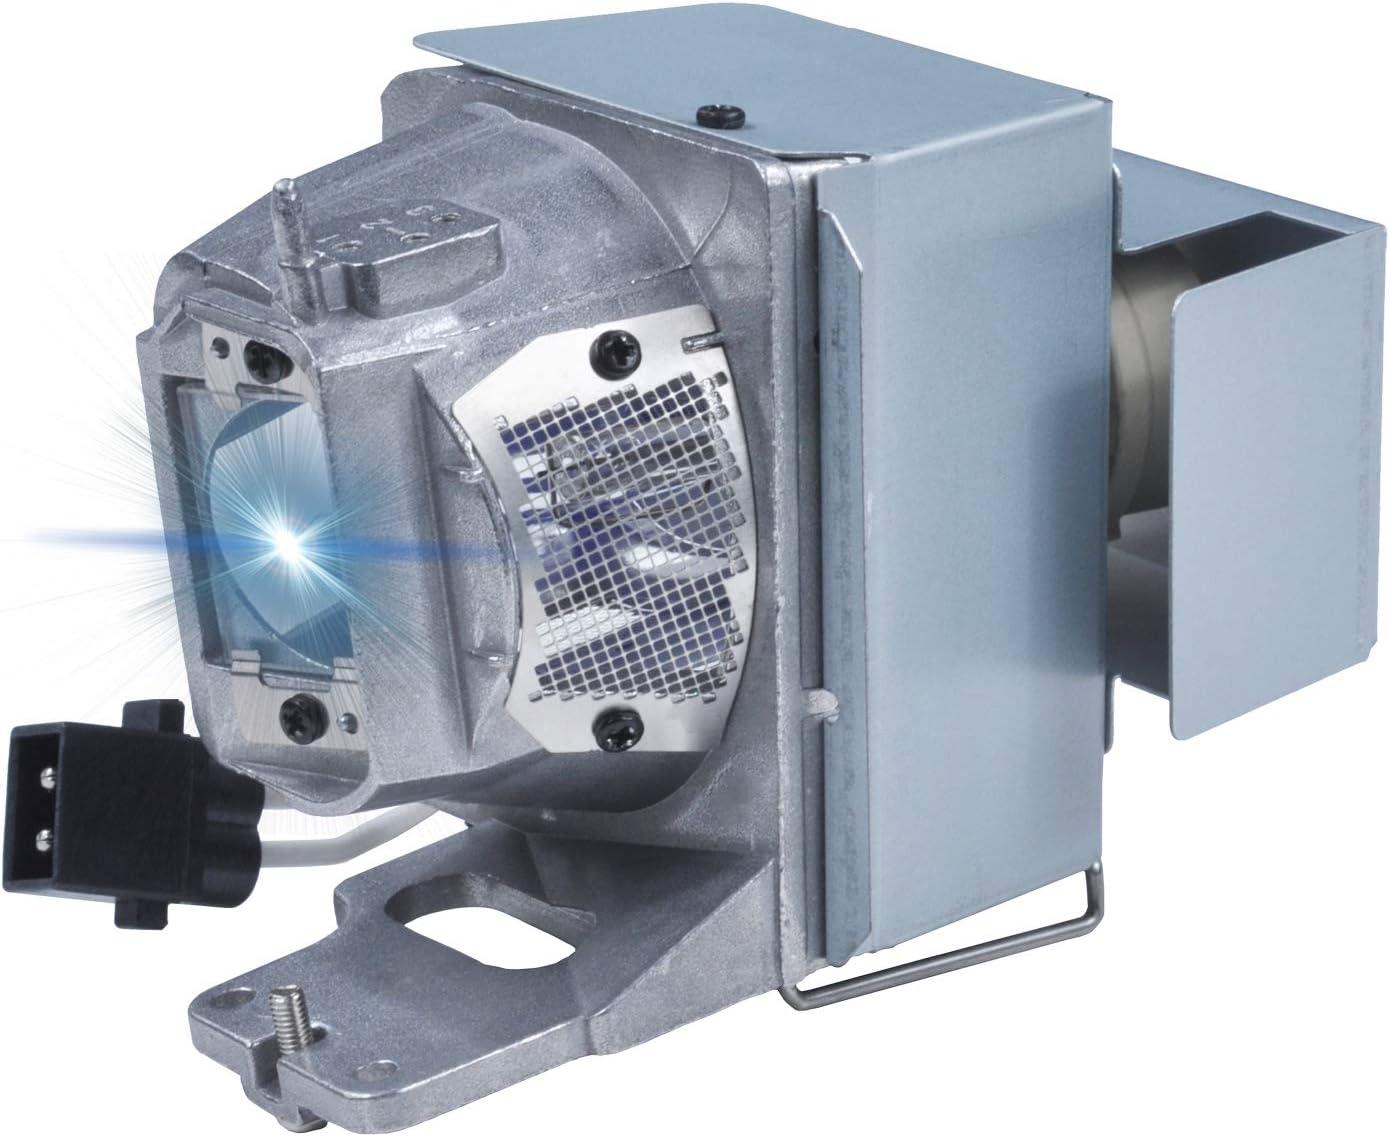 AWO Original Bulb Inside BL-FP240G / SP.7AZ01GC01 Replacement Lamp with Housing for OPTOMA DH350 EH334 EH335 EH336 EH337 HD143X HD144X HD270e HD27e WU335 WU337